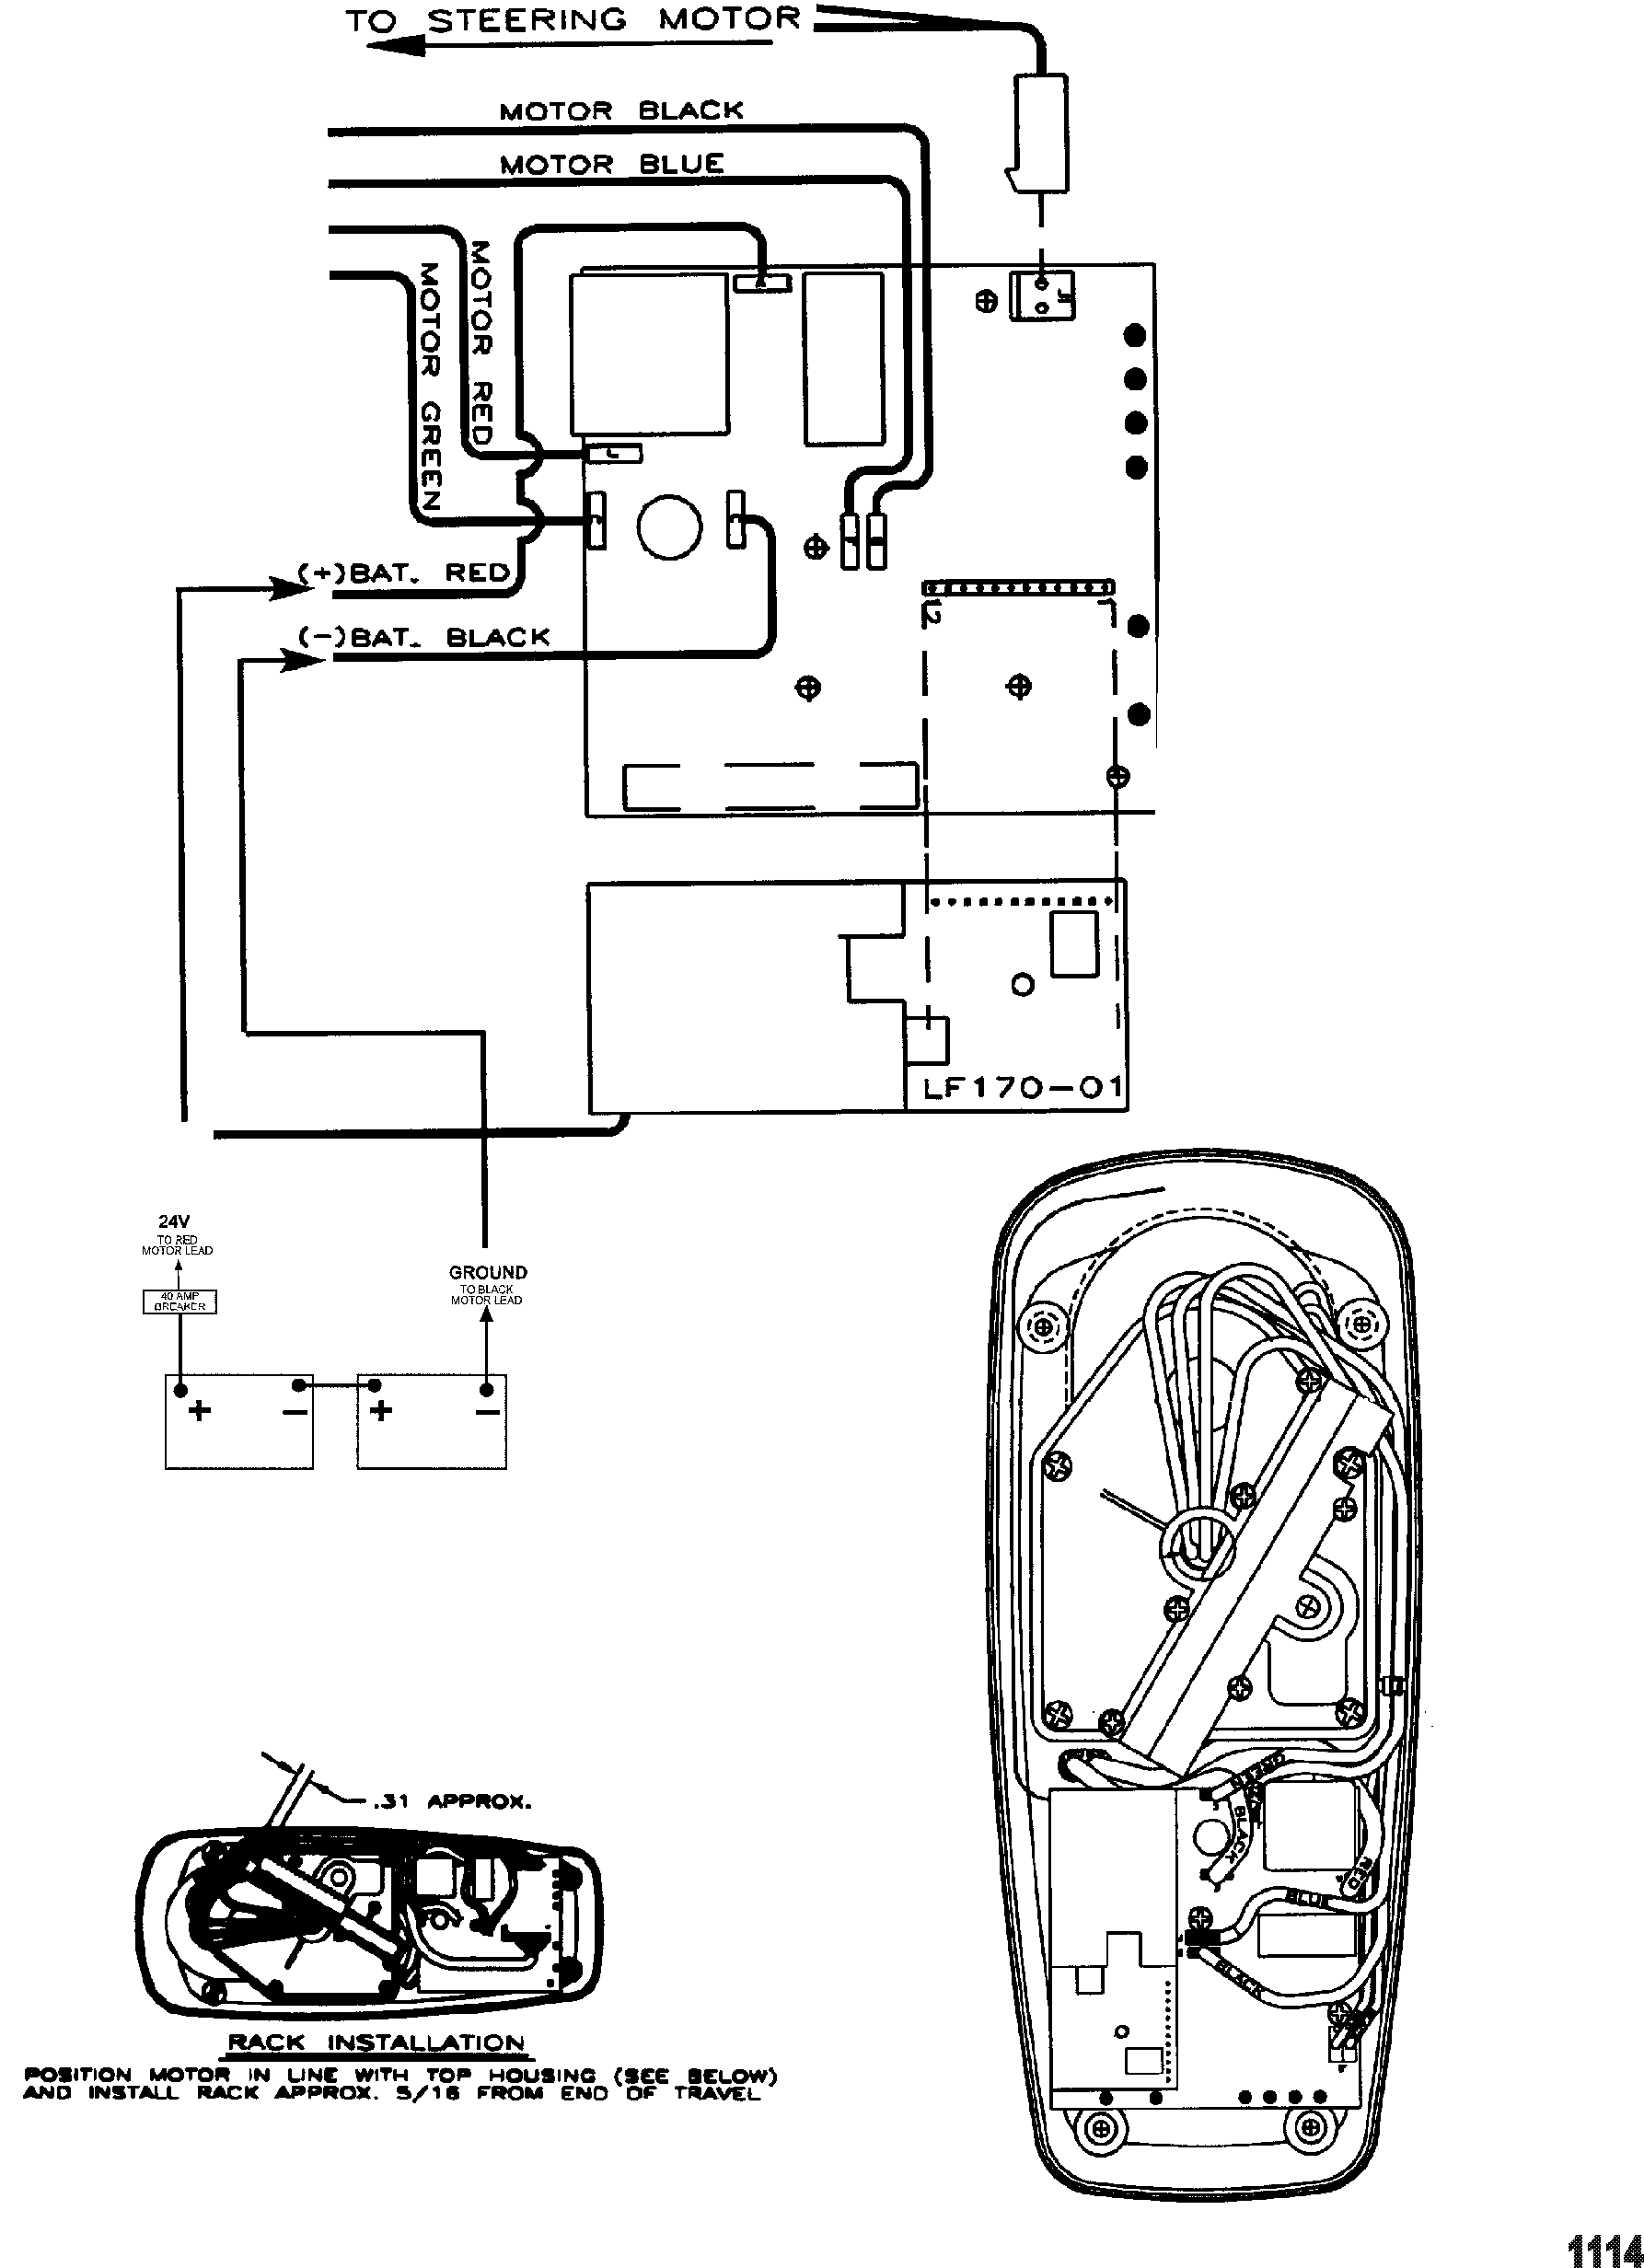 4 plug wiring diagram 24v trolling motor motorguide 24